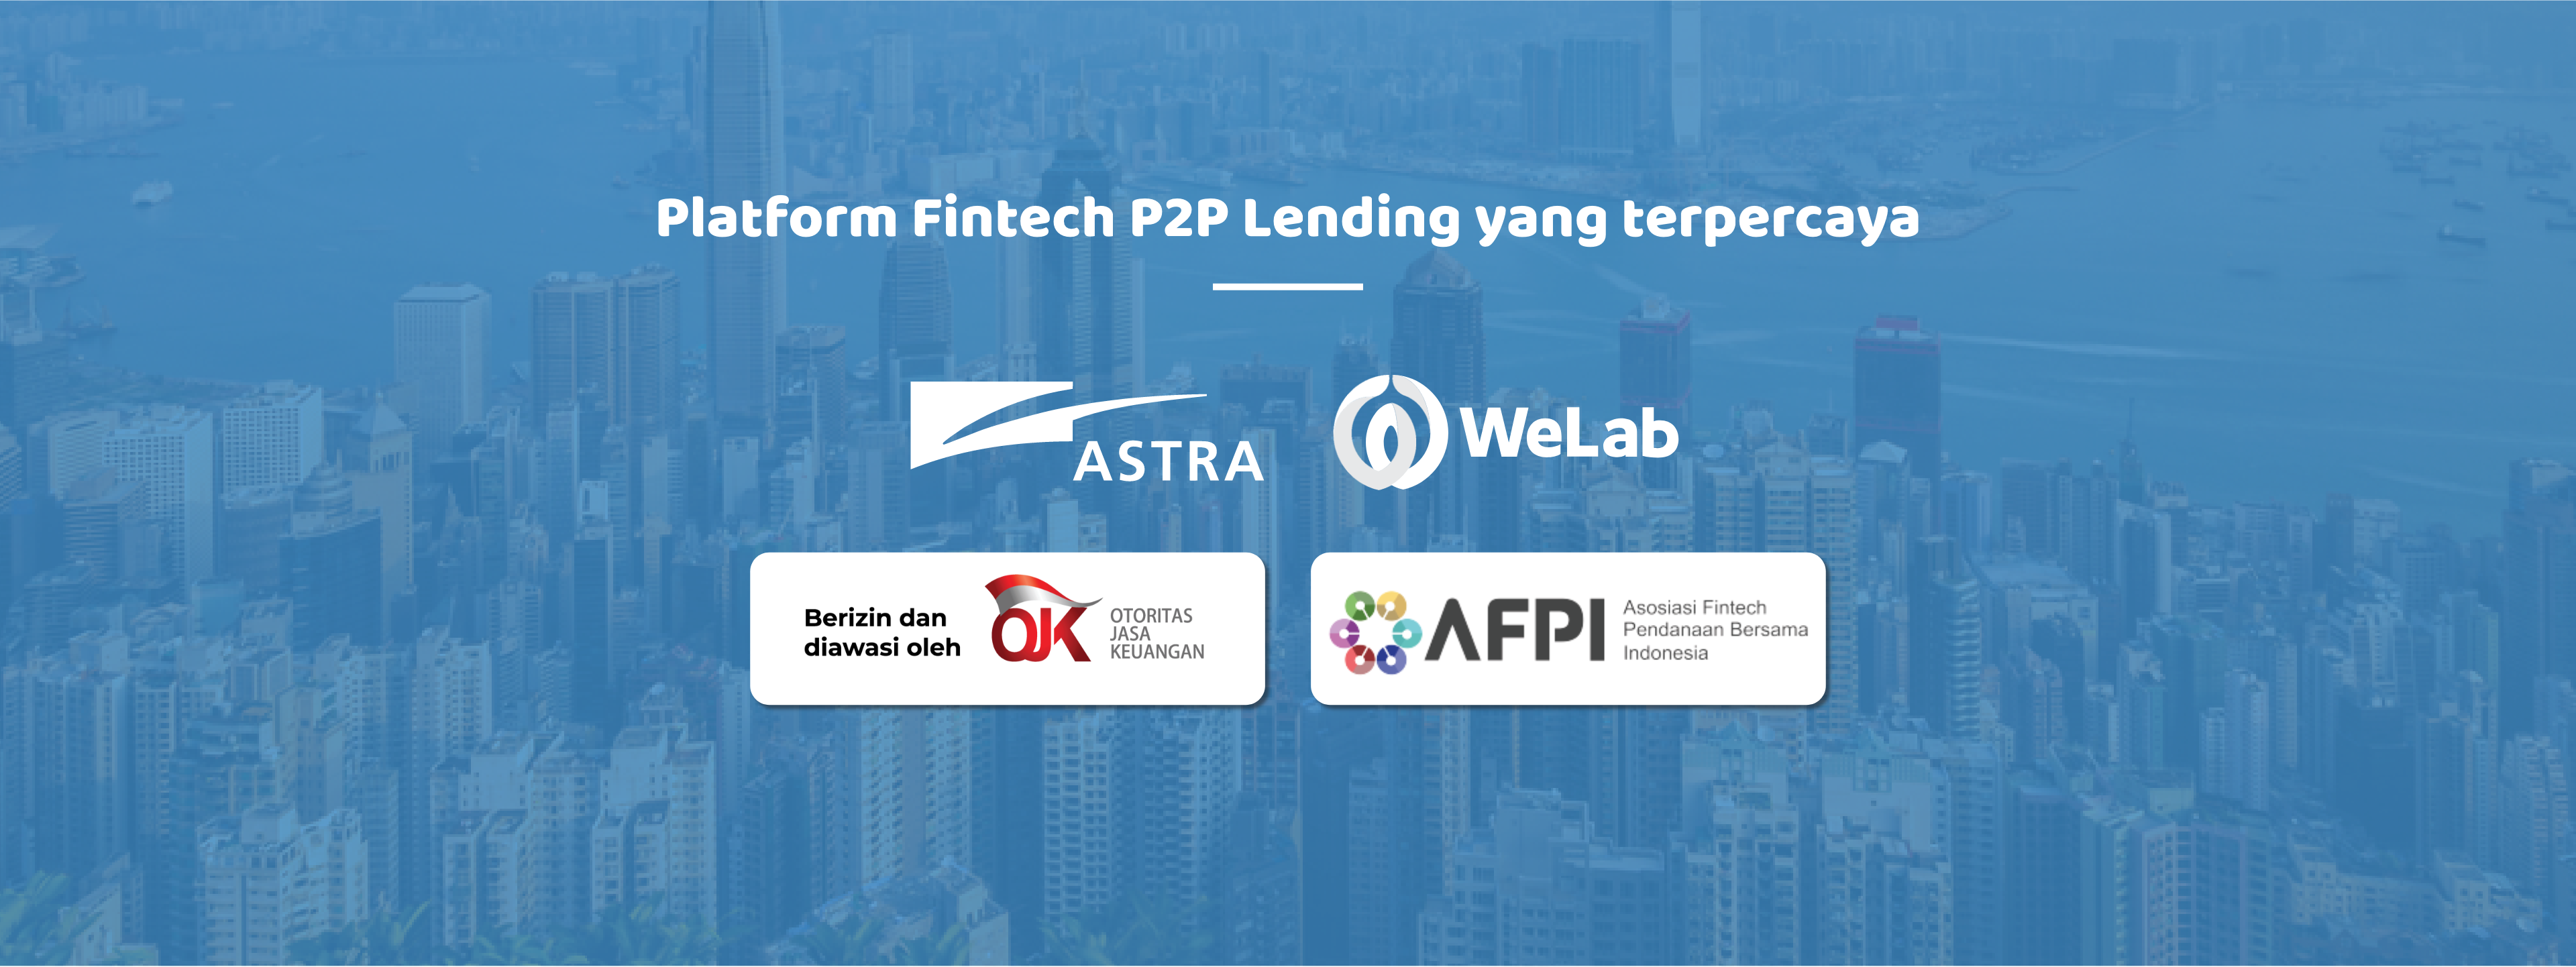 Aplikasi Pinjaman Uang Online Cepat Tanpa Jaminan Maucash